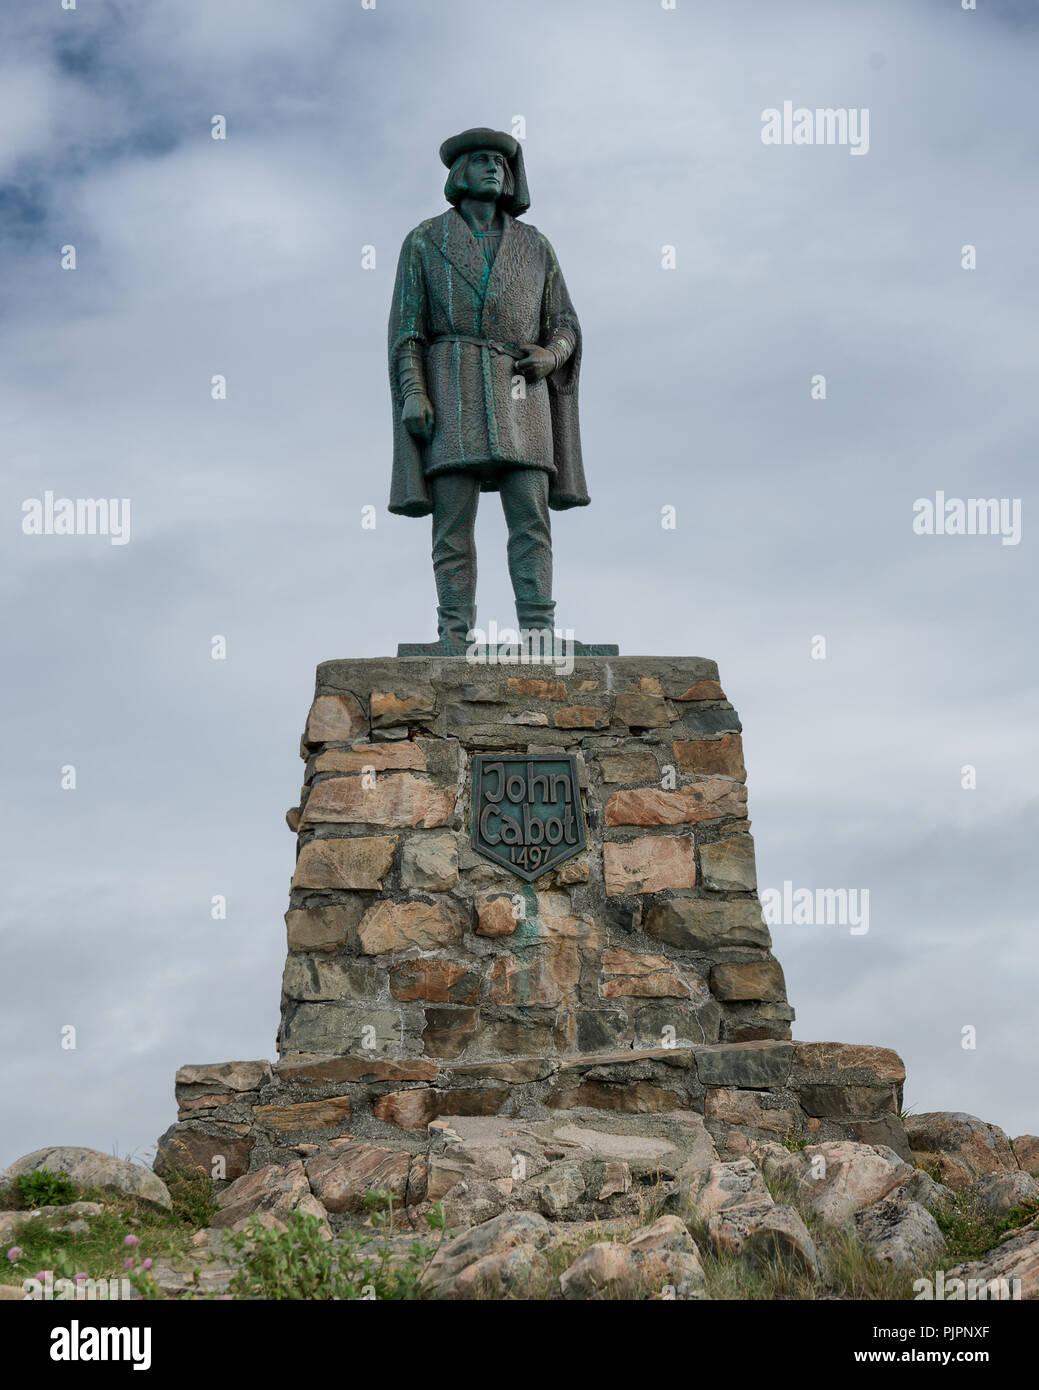 A bronze statue of the explorer John Cabot at Cape Bonavista in Bonavista, Newfoundland and Labrador - Stock Image